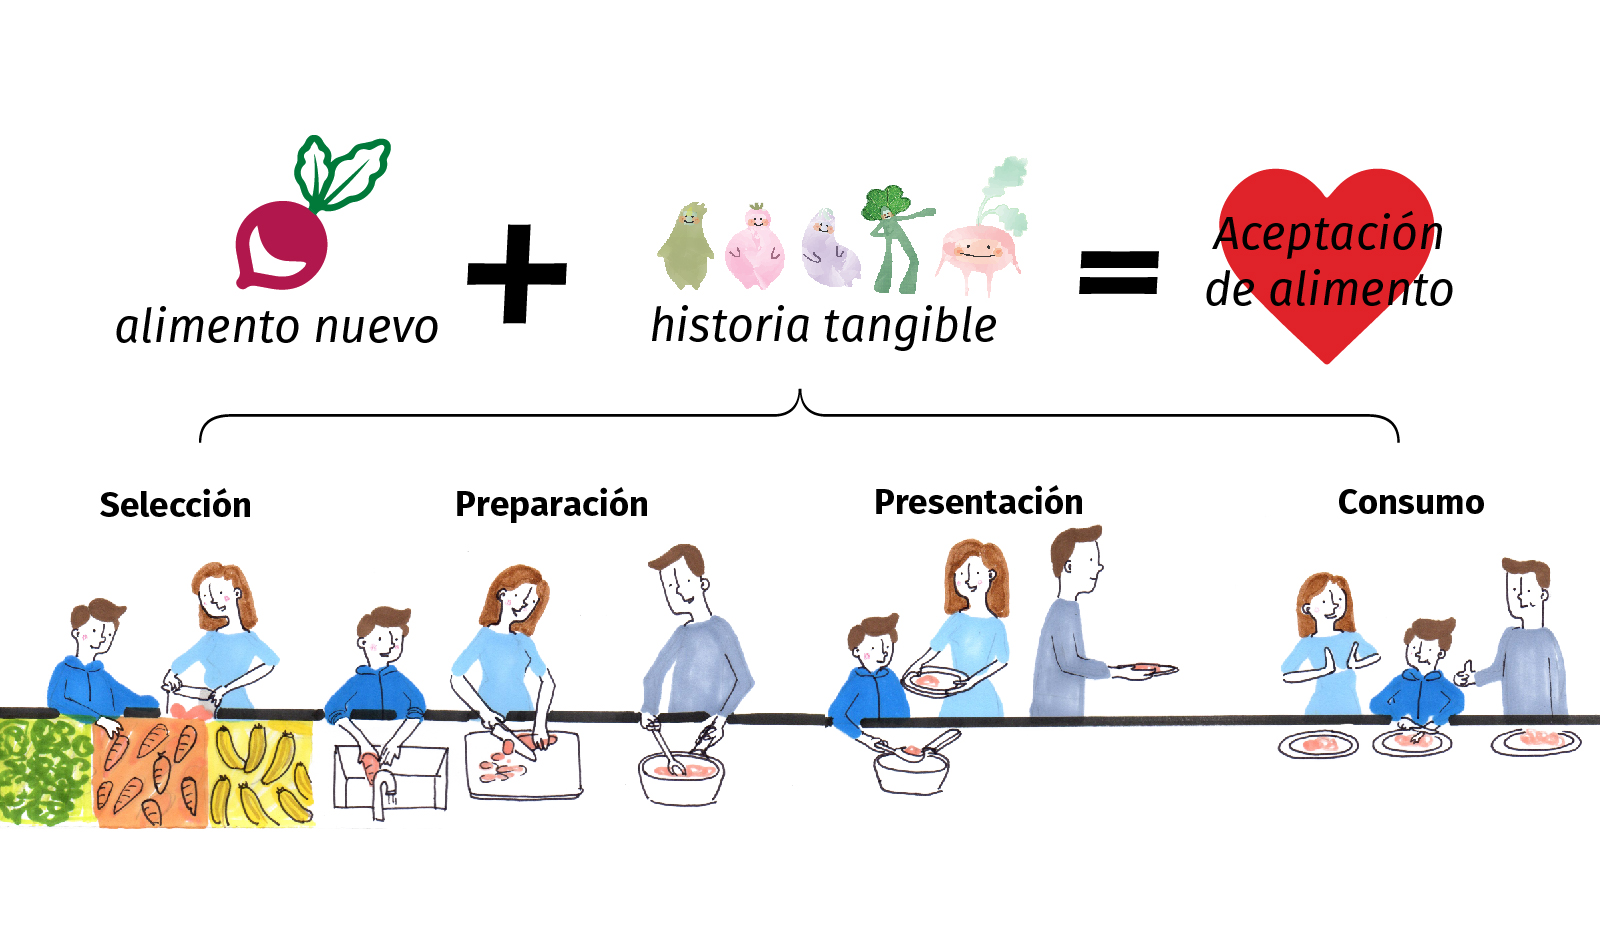 contenido_-_por_un_futuro_comestible_-_español-06